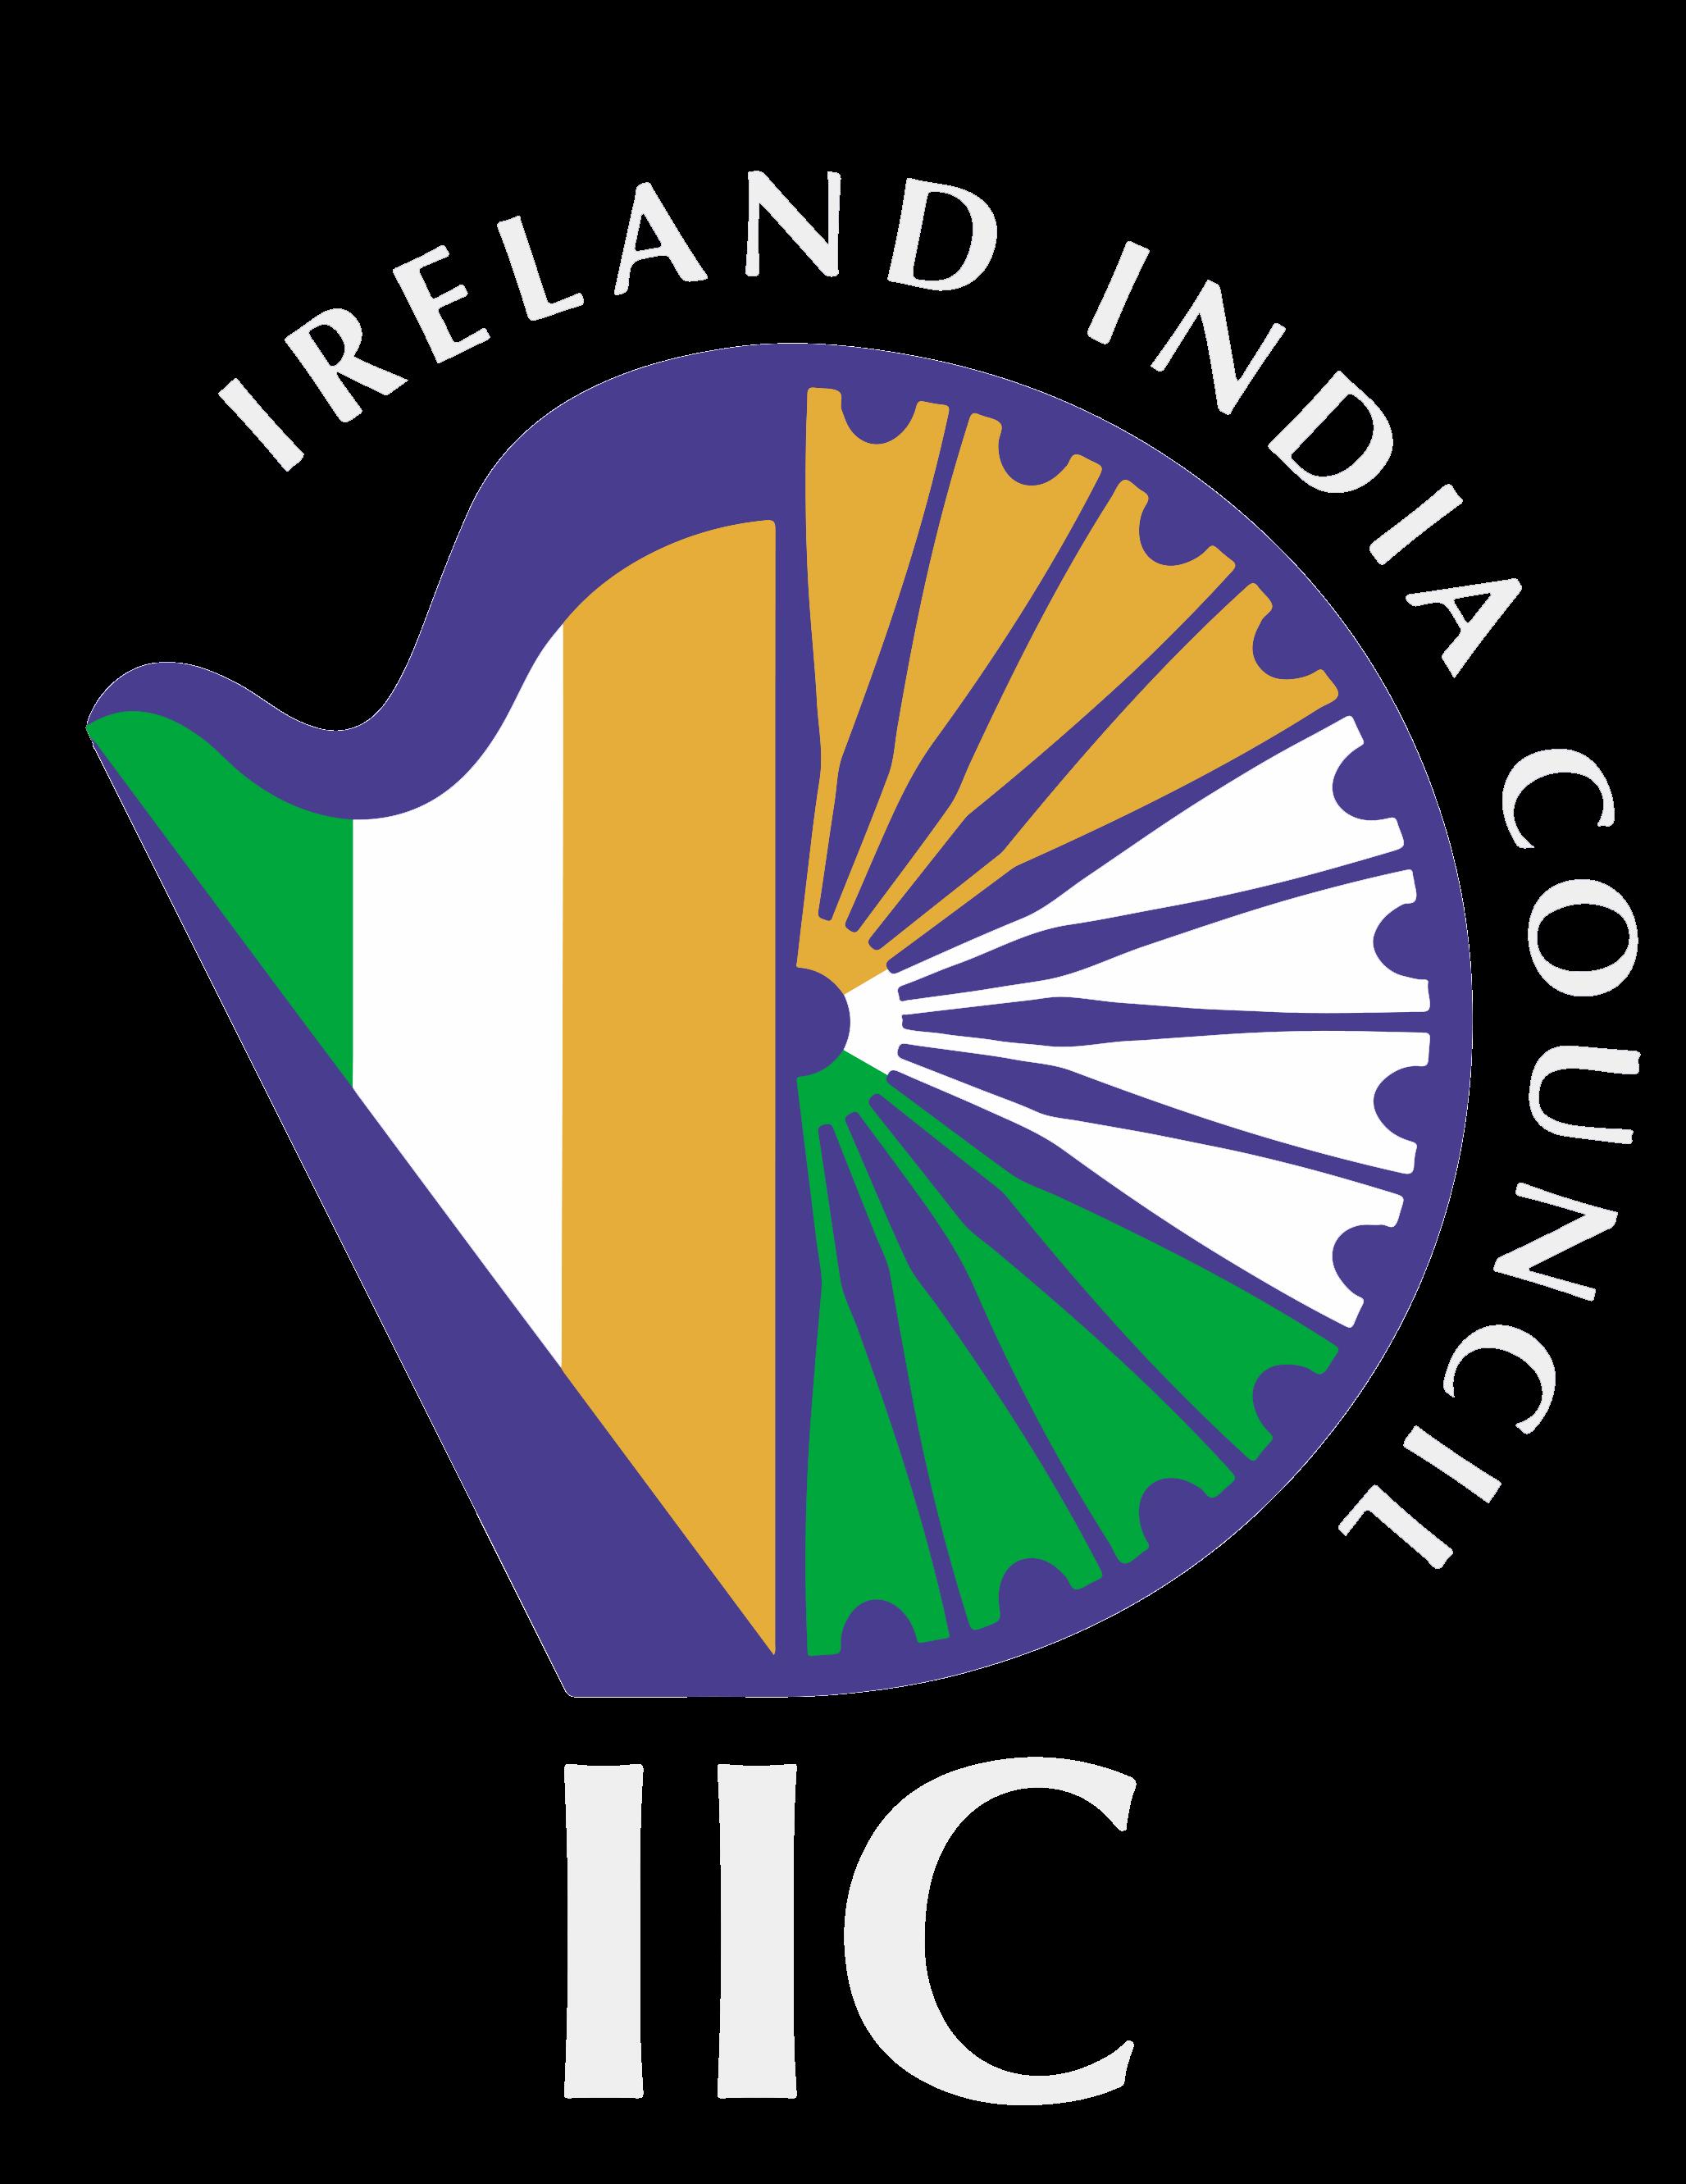 IIC – IRELAND INDIA COUNCIL